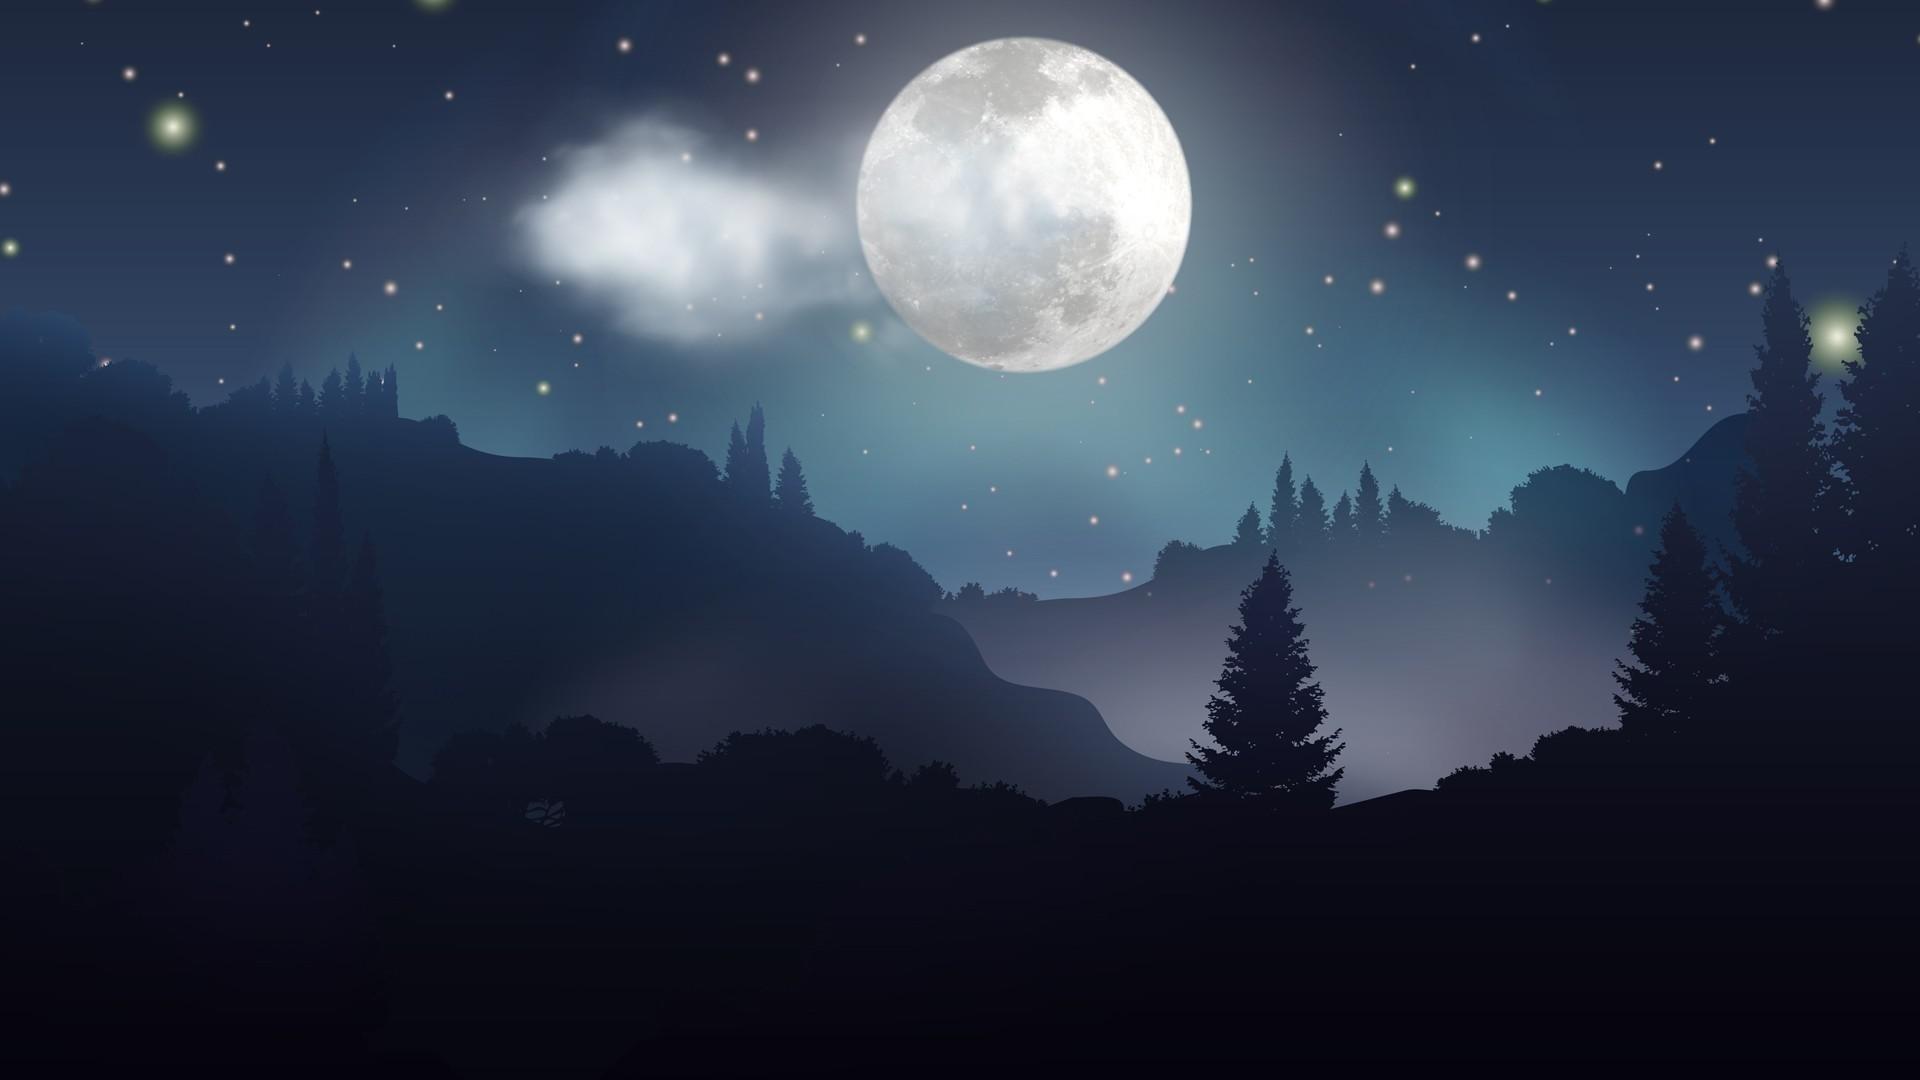 Moon And Stars PC Wallpaper HD